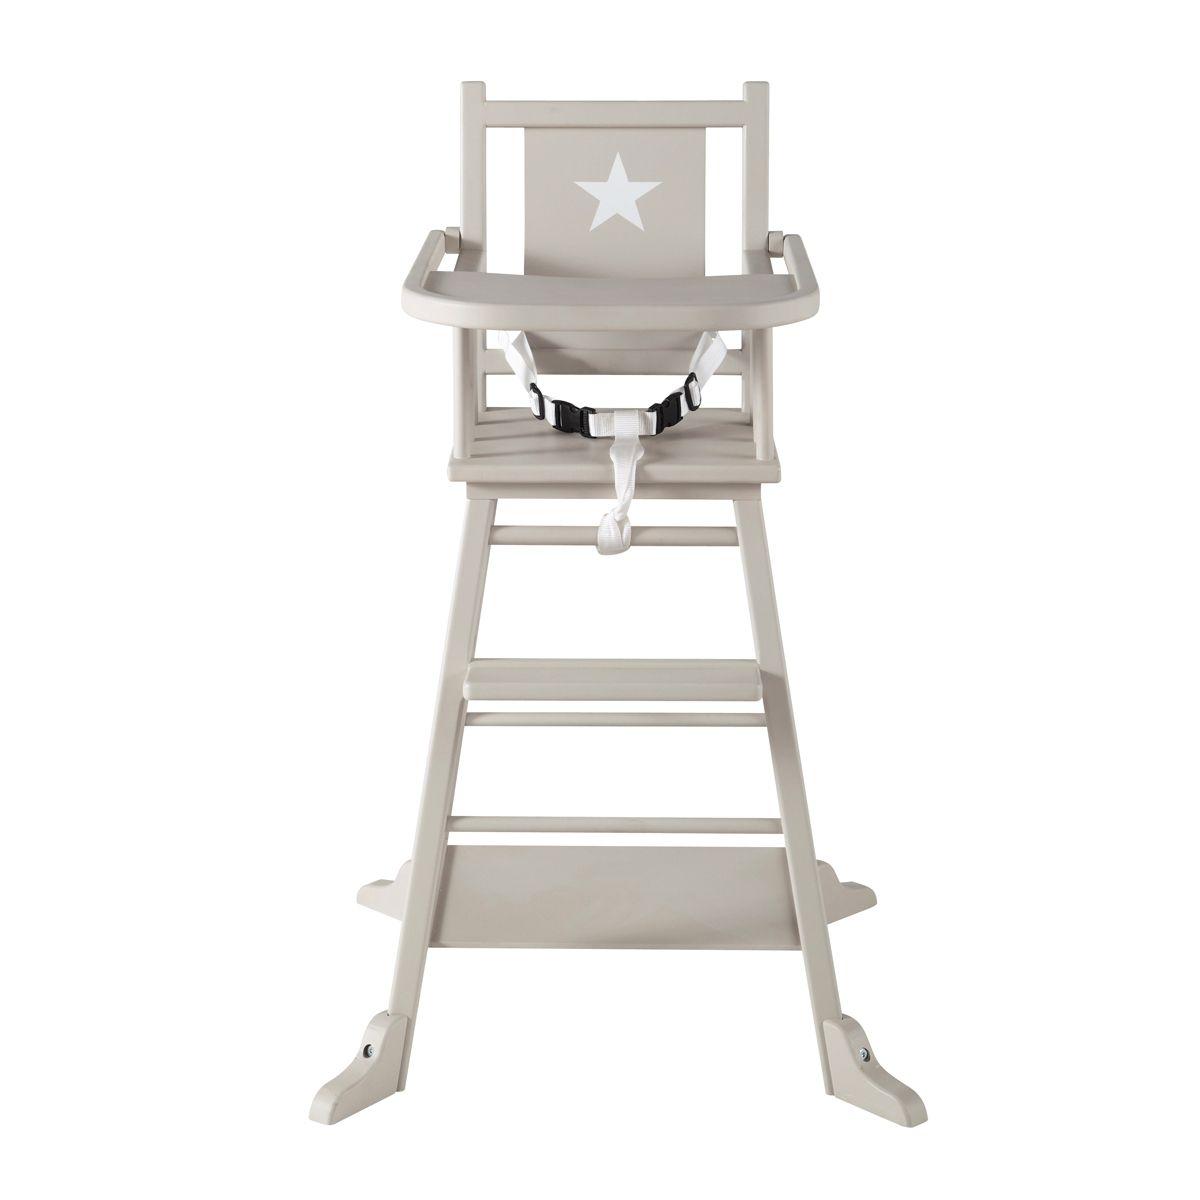 Chambre Bebe Chaise Haute Bebe Chaise Haute Chaise Haute Bois